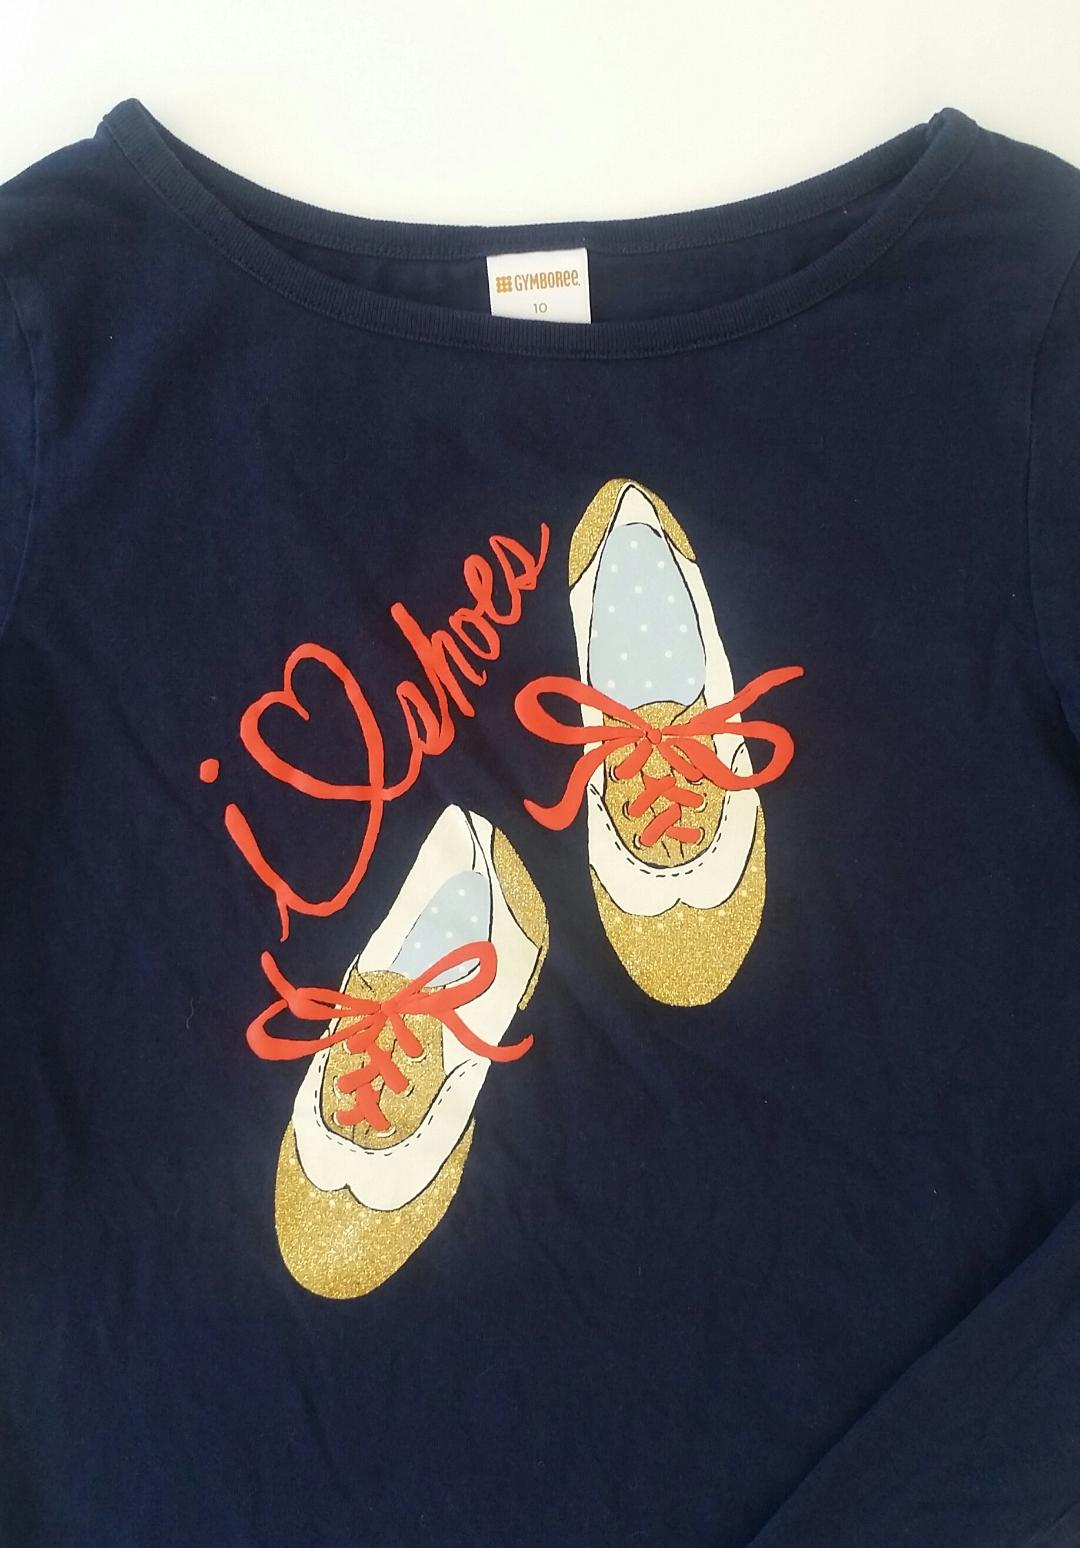 Gymboree-10-YEARS-Long-sleeve-T-Shirt_2160140C.jpg